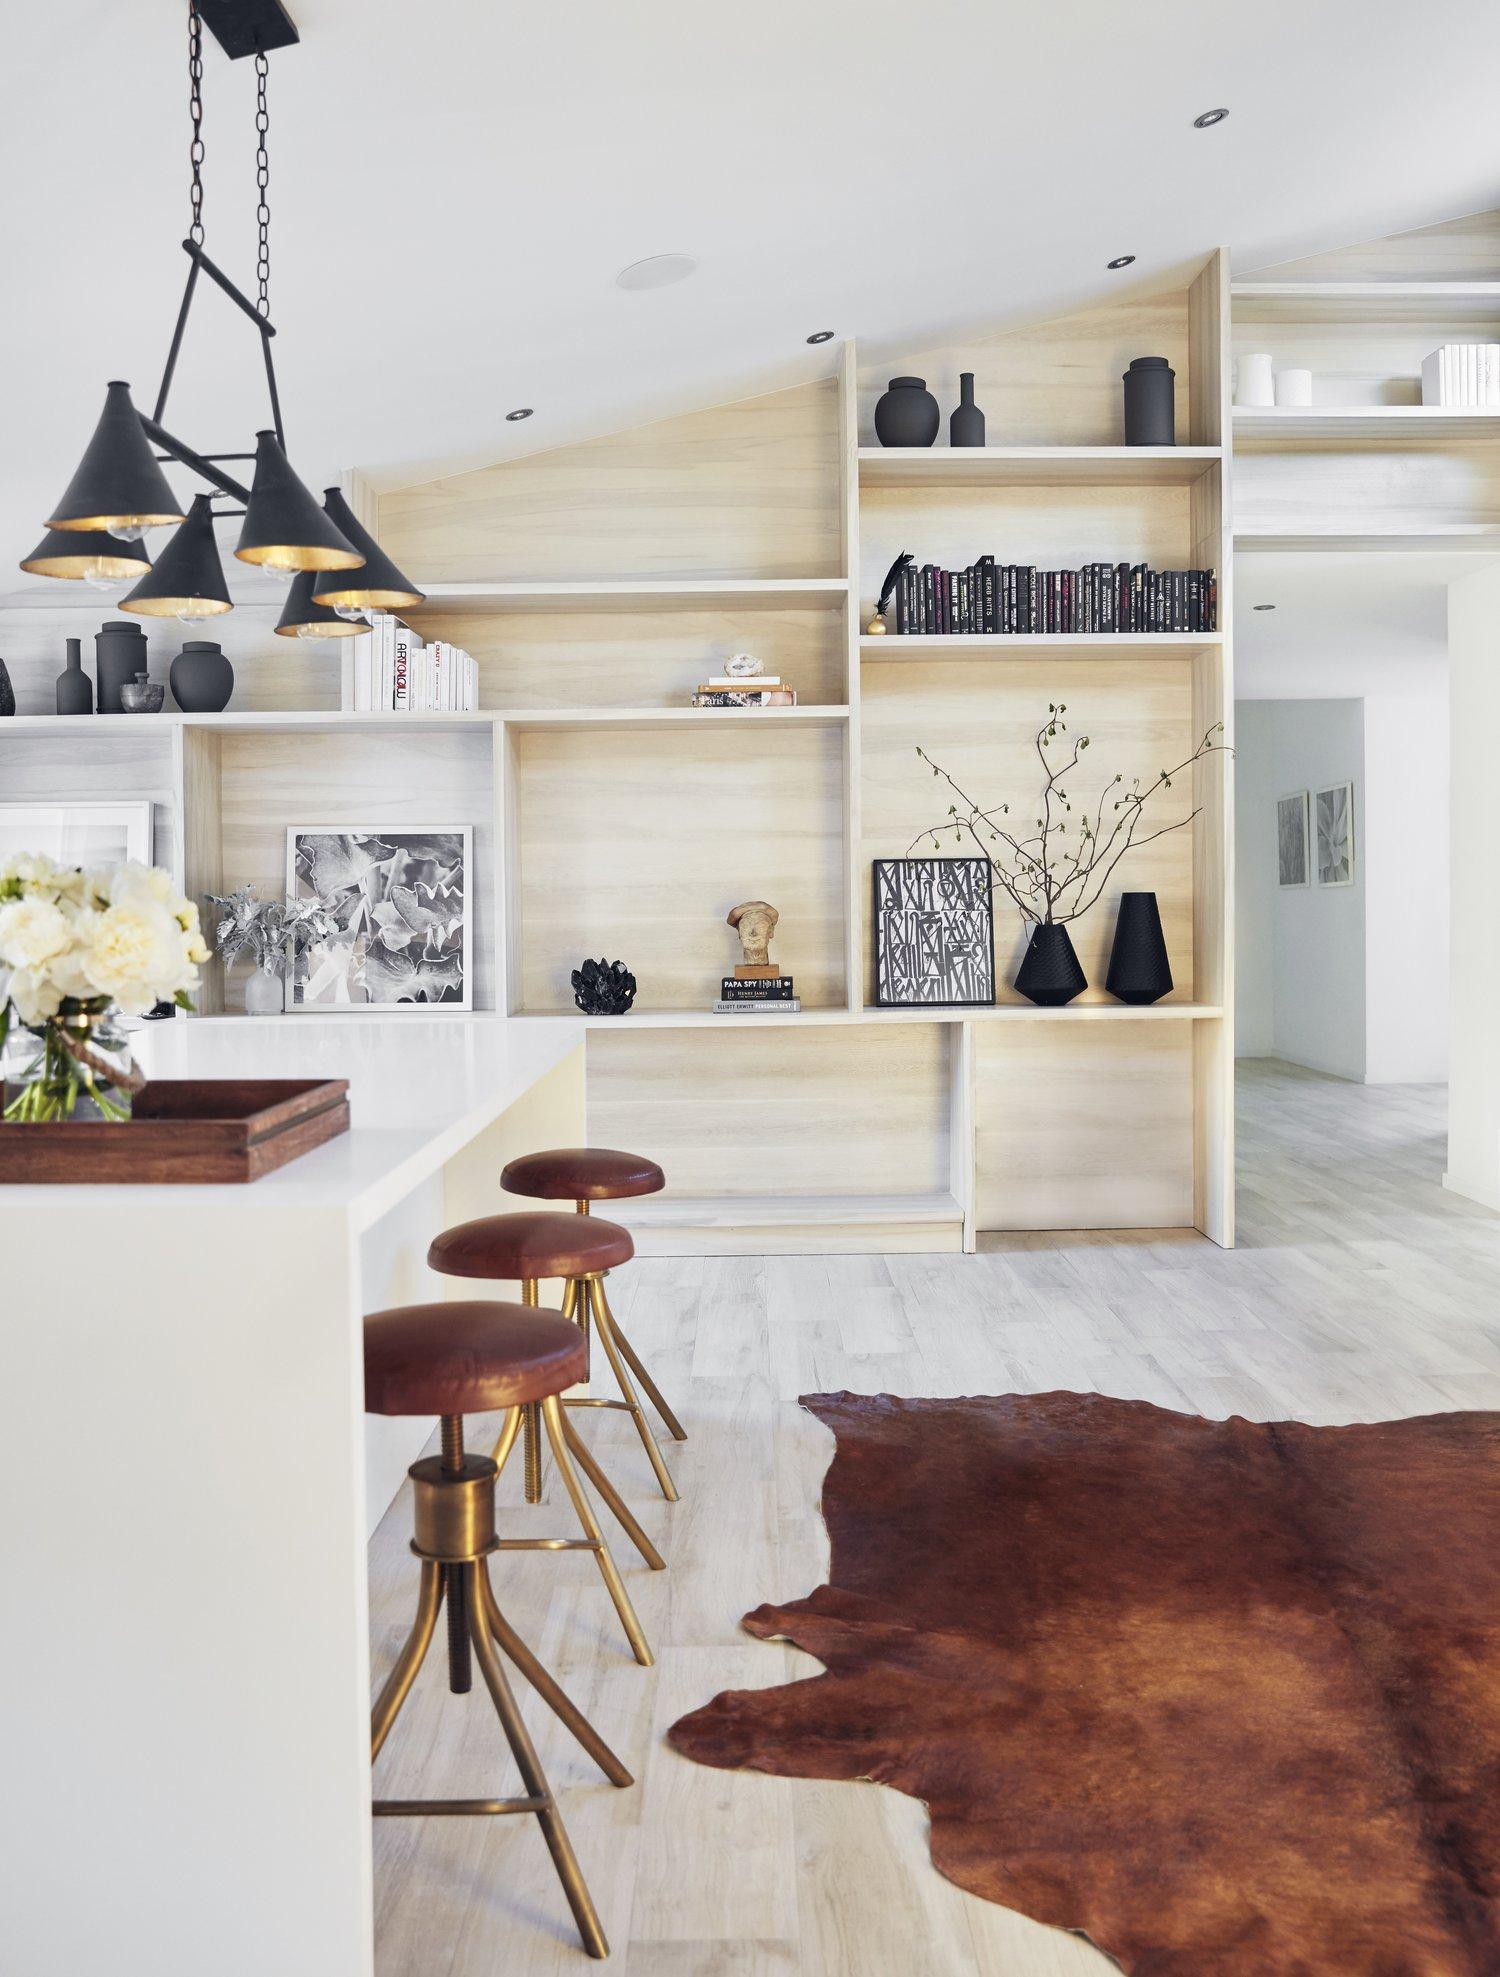 2016 Home Design Trends — Riskin Partners - The #1 Team in Montecito ...